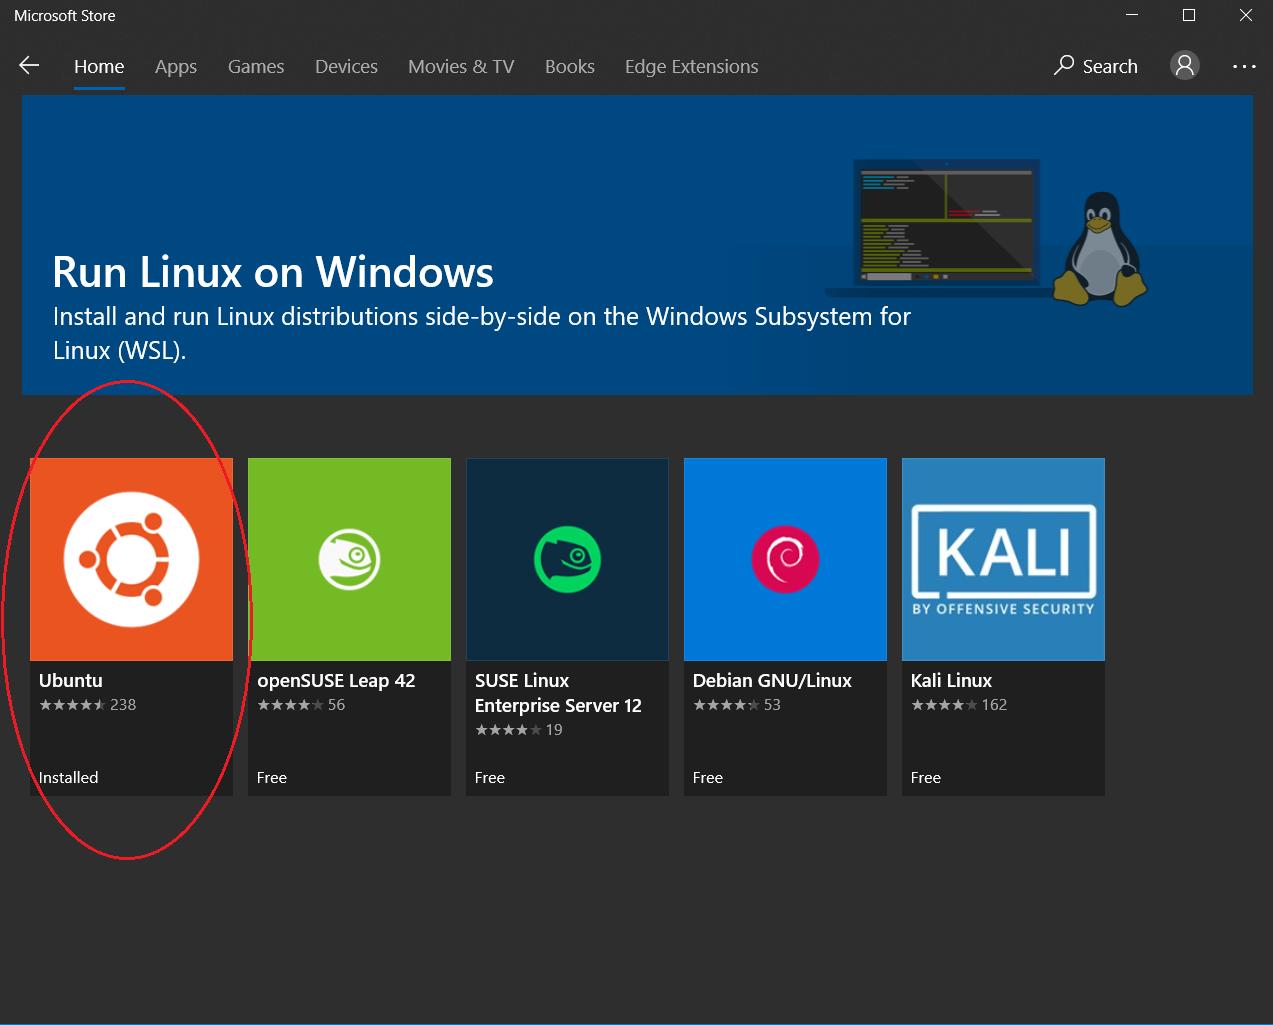 ubuntu choice in microsoft store